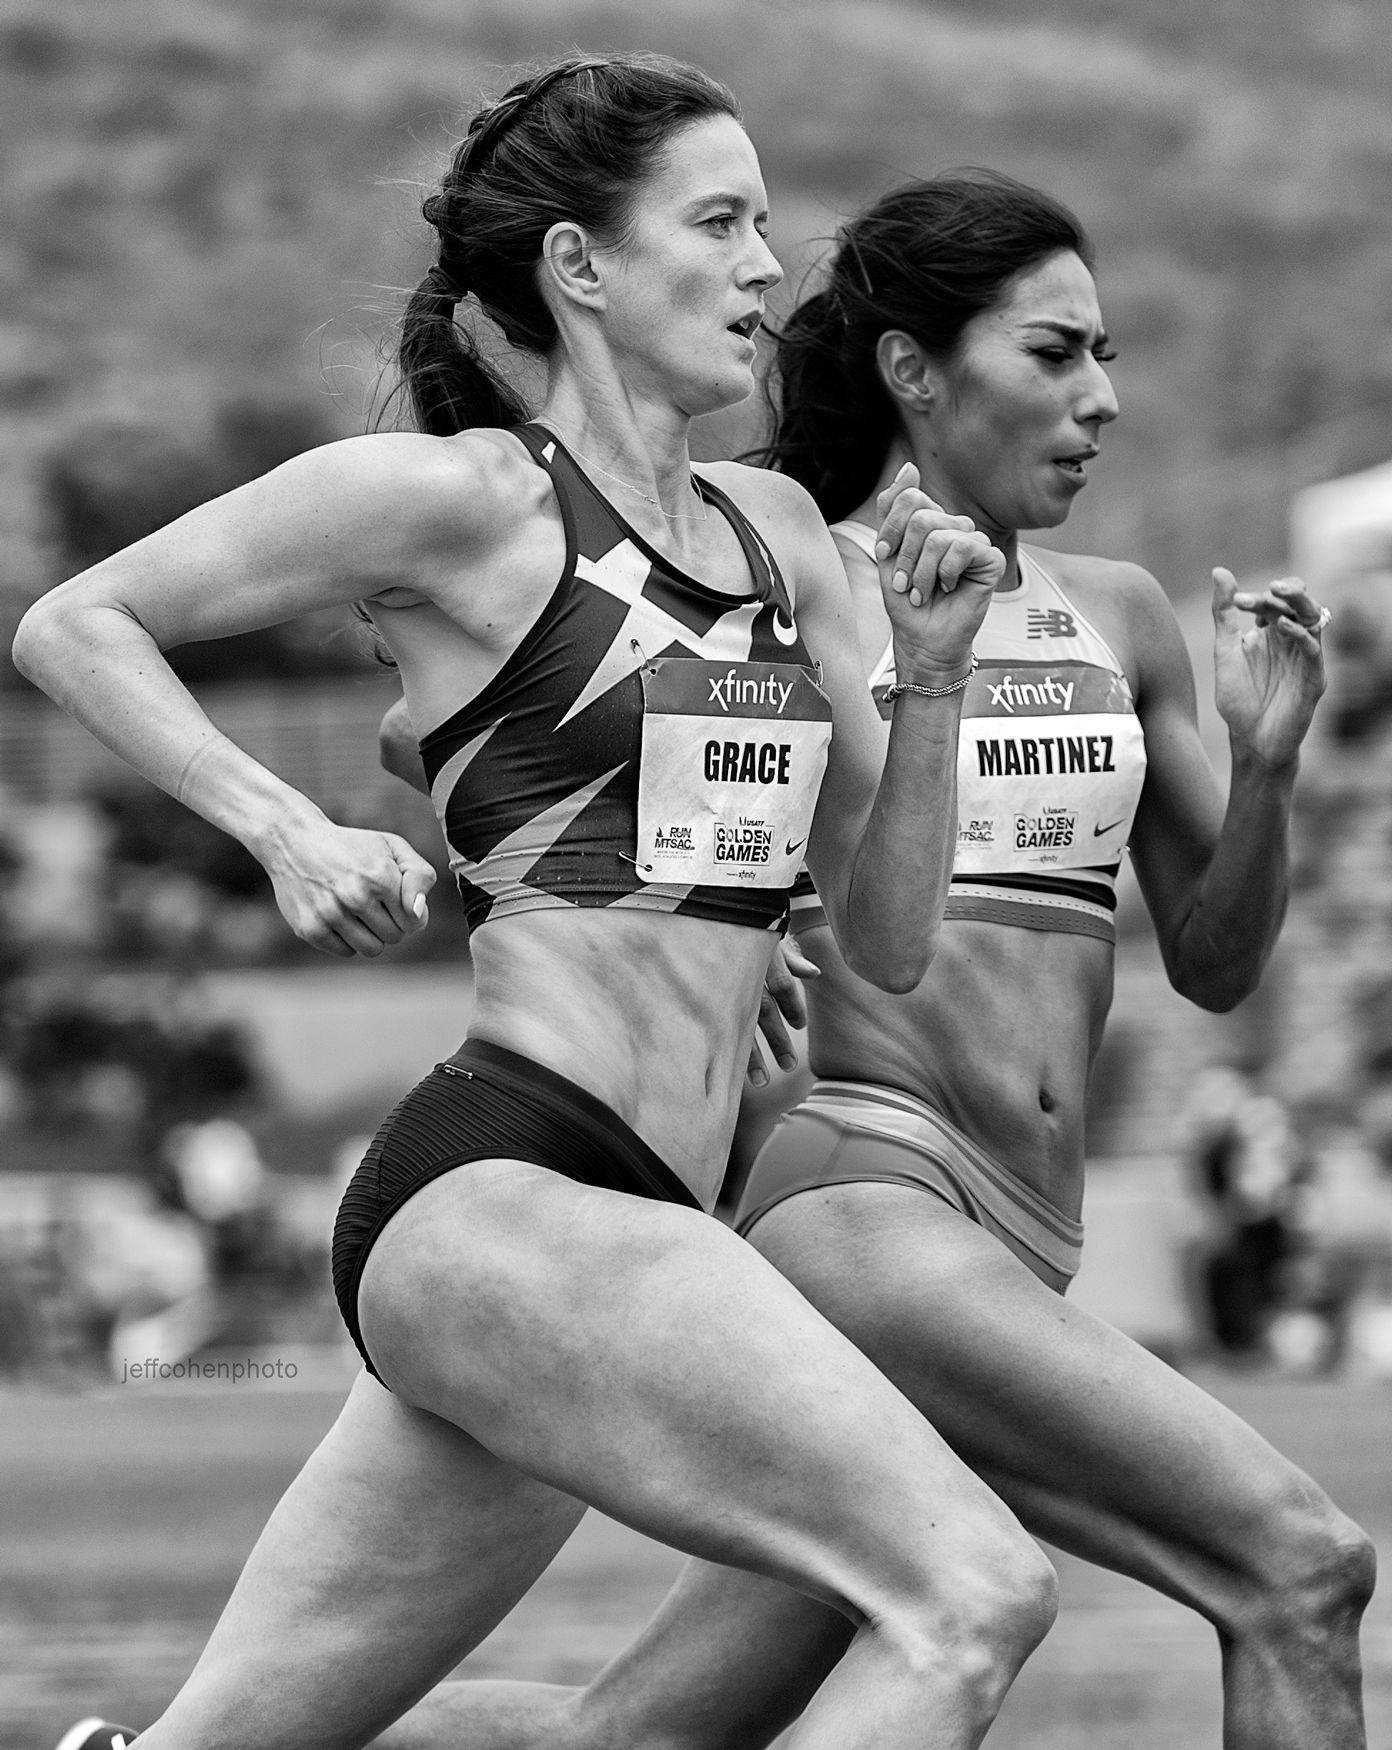 Kate Grace and Brenda Martinez, 800 meters , 2021 USATF Golden Games